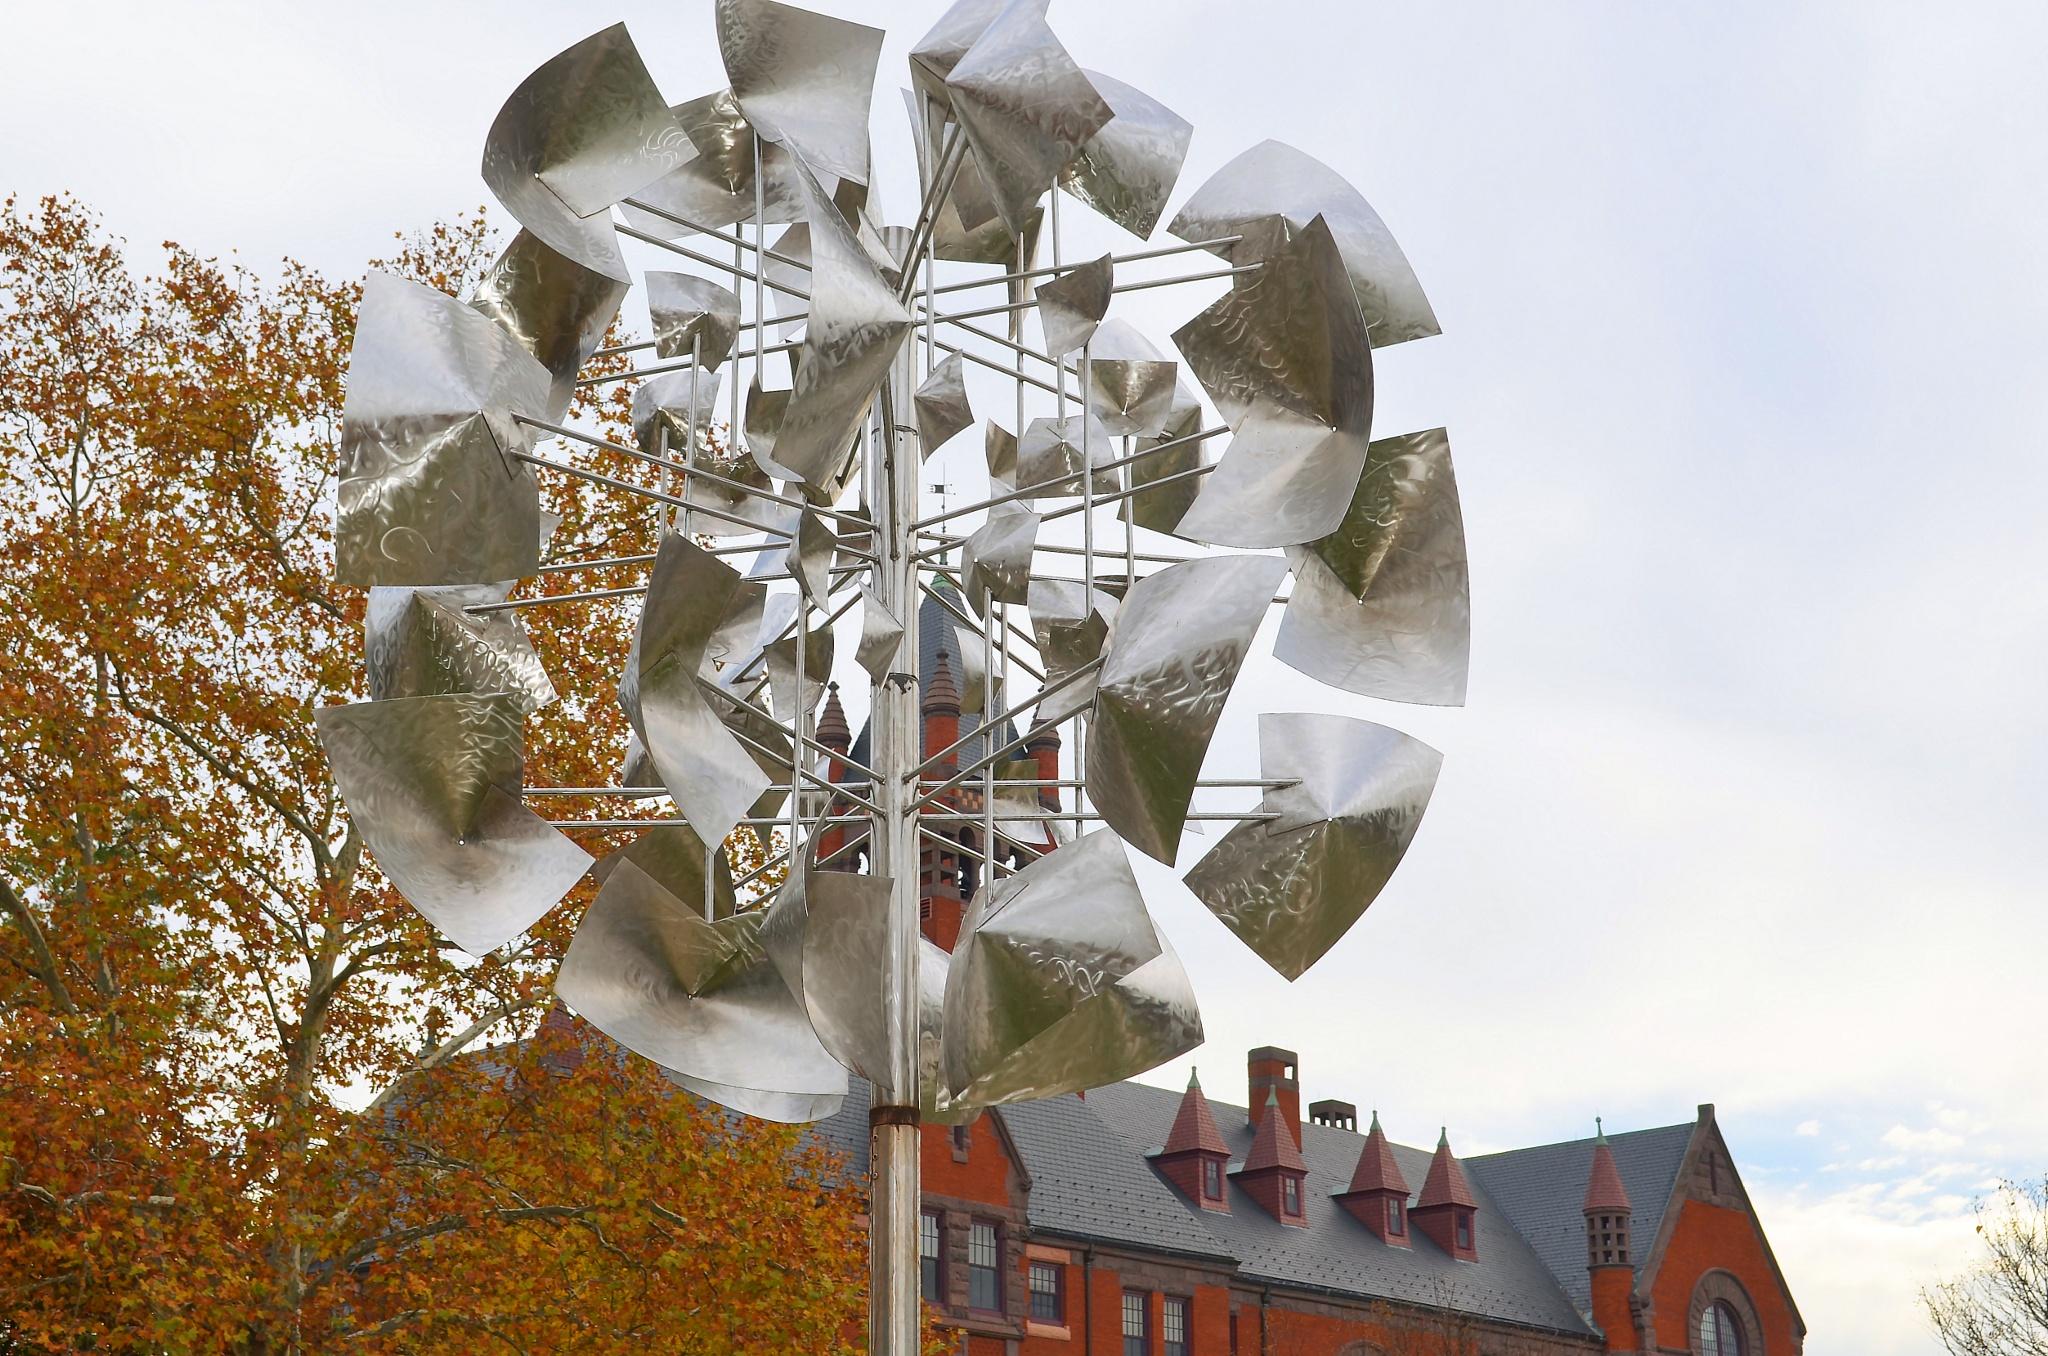 Spinning Art by JimFleenor